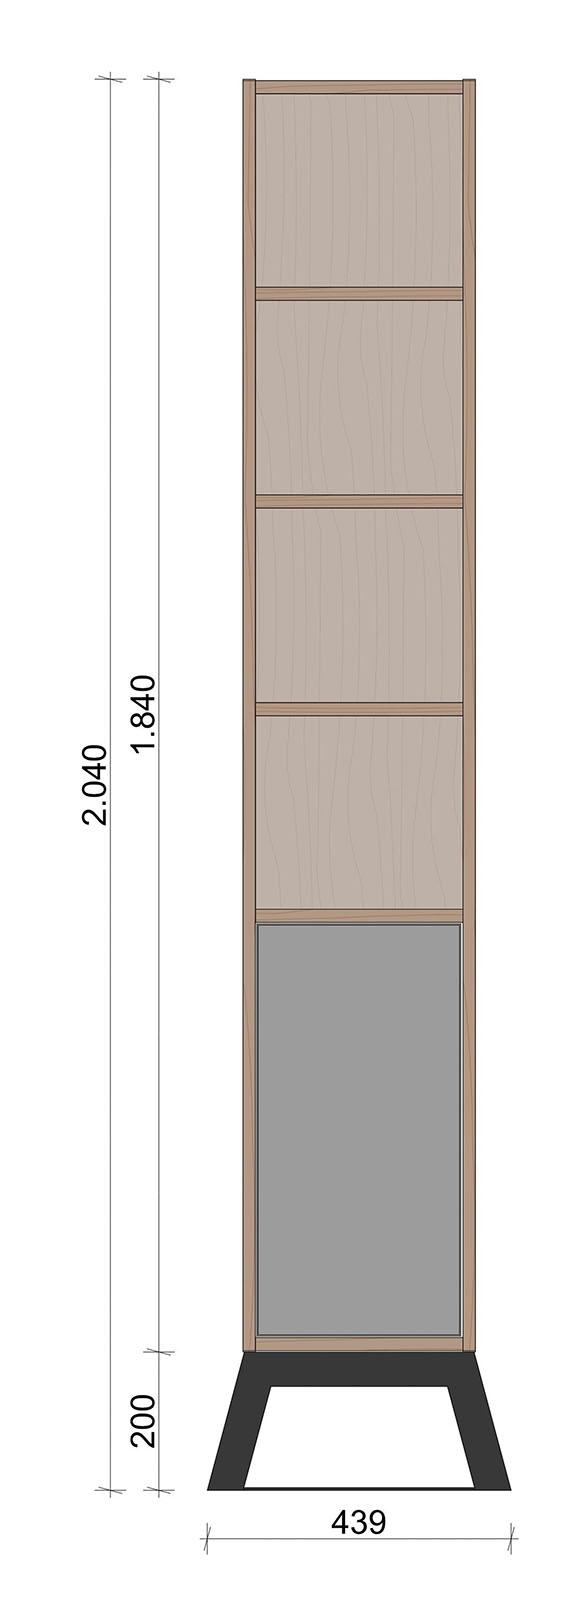 Schiță dimensiuni Dulap dormitor, inalt, cu o usa - Eter